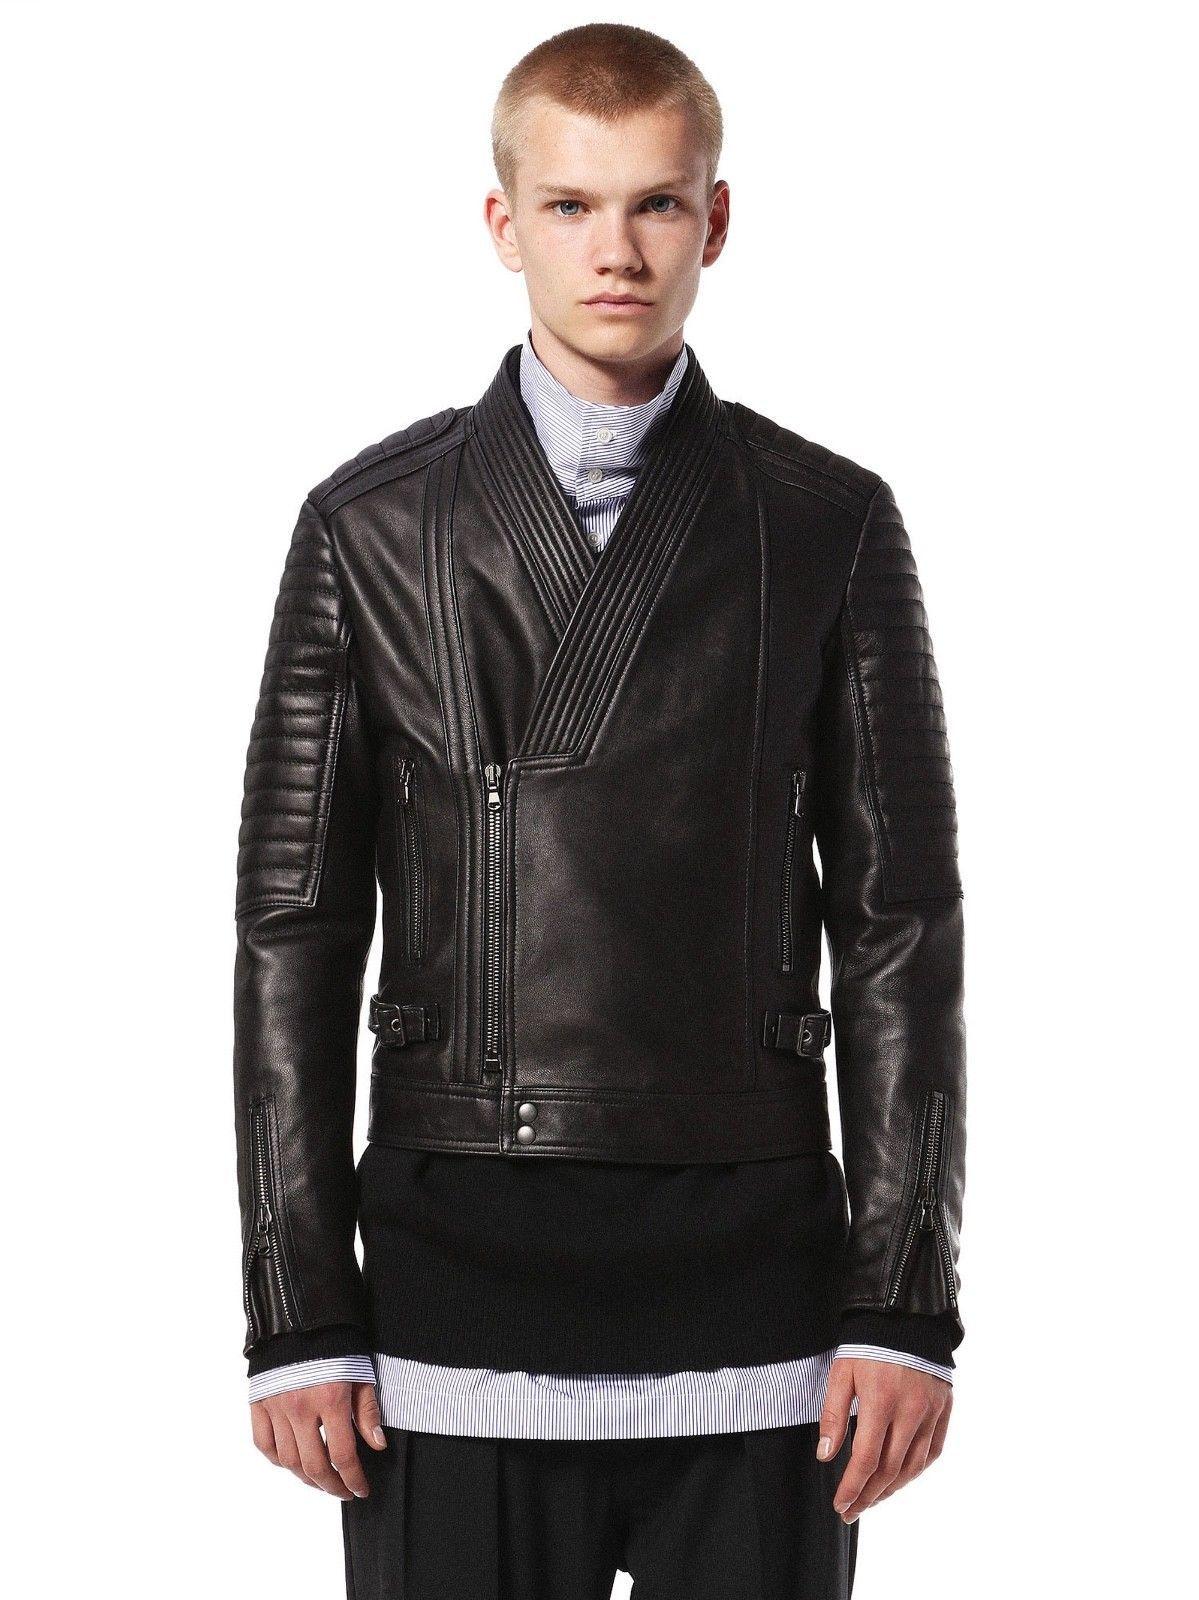 Fully Customised Handmade Lambskin Natural Leather Mens